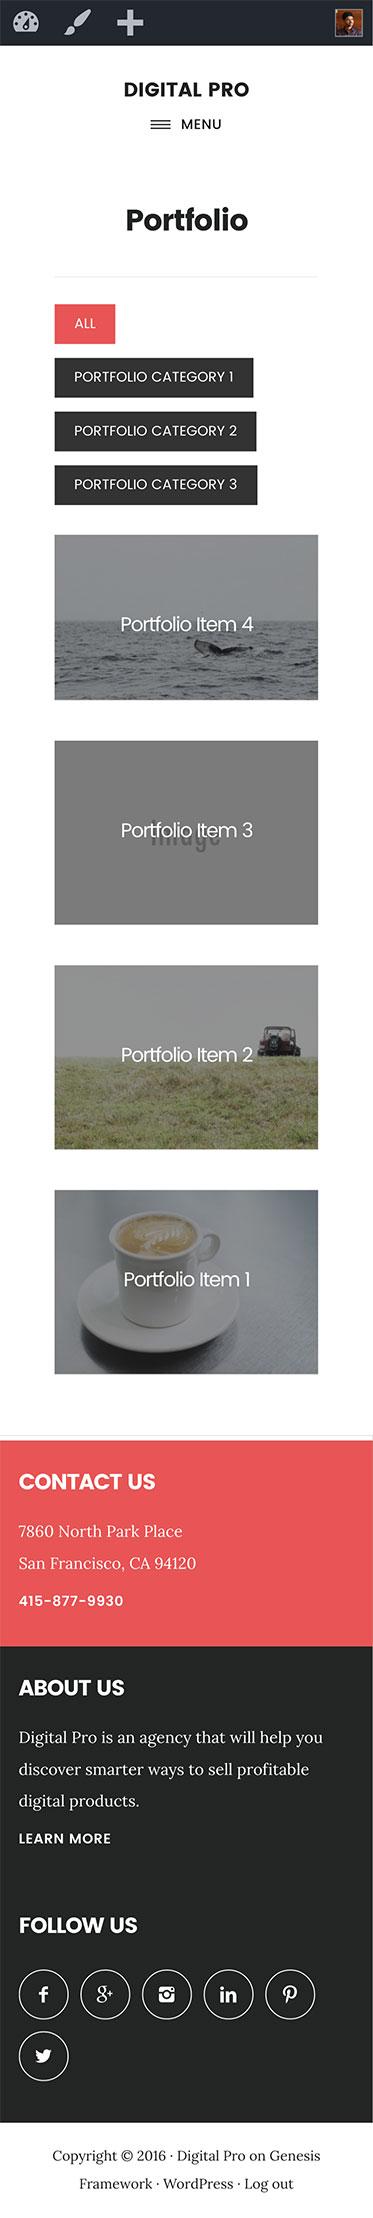 digital-pro-filterable-portfolio-iPhone-portrait